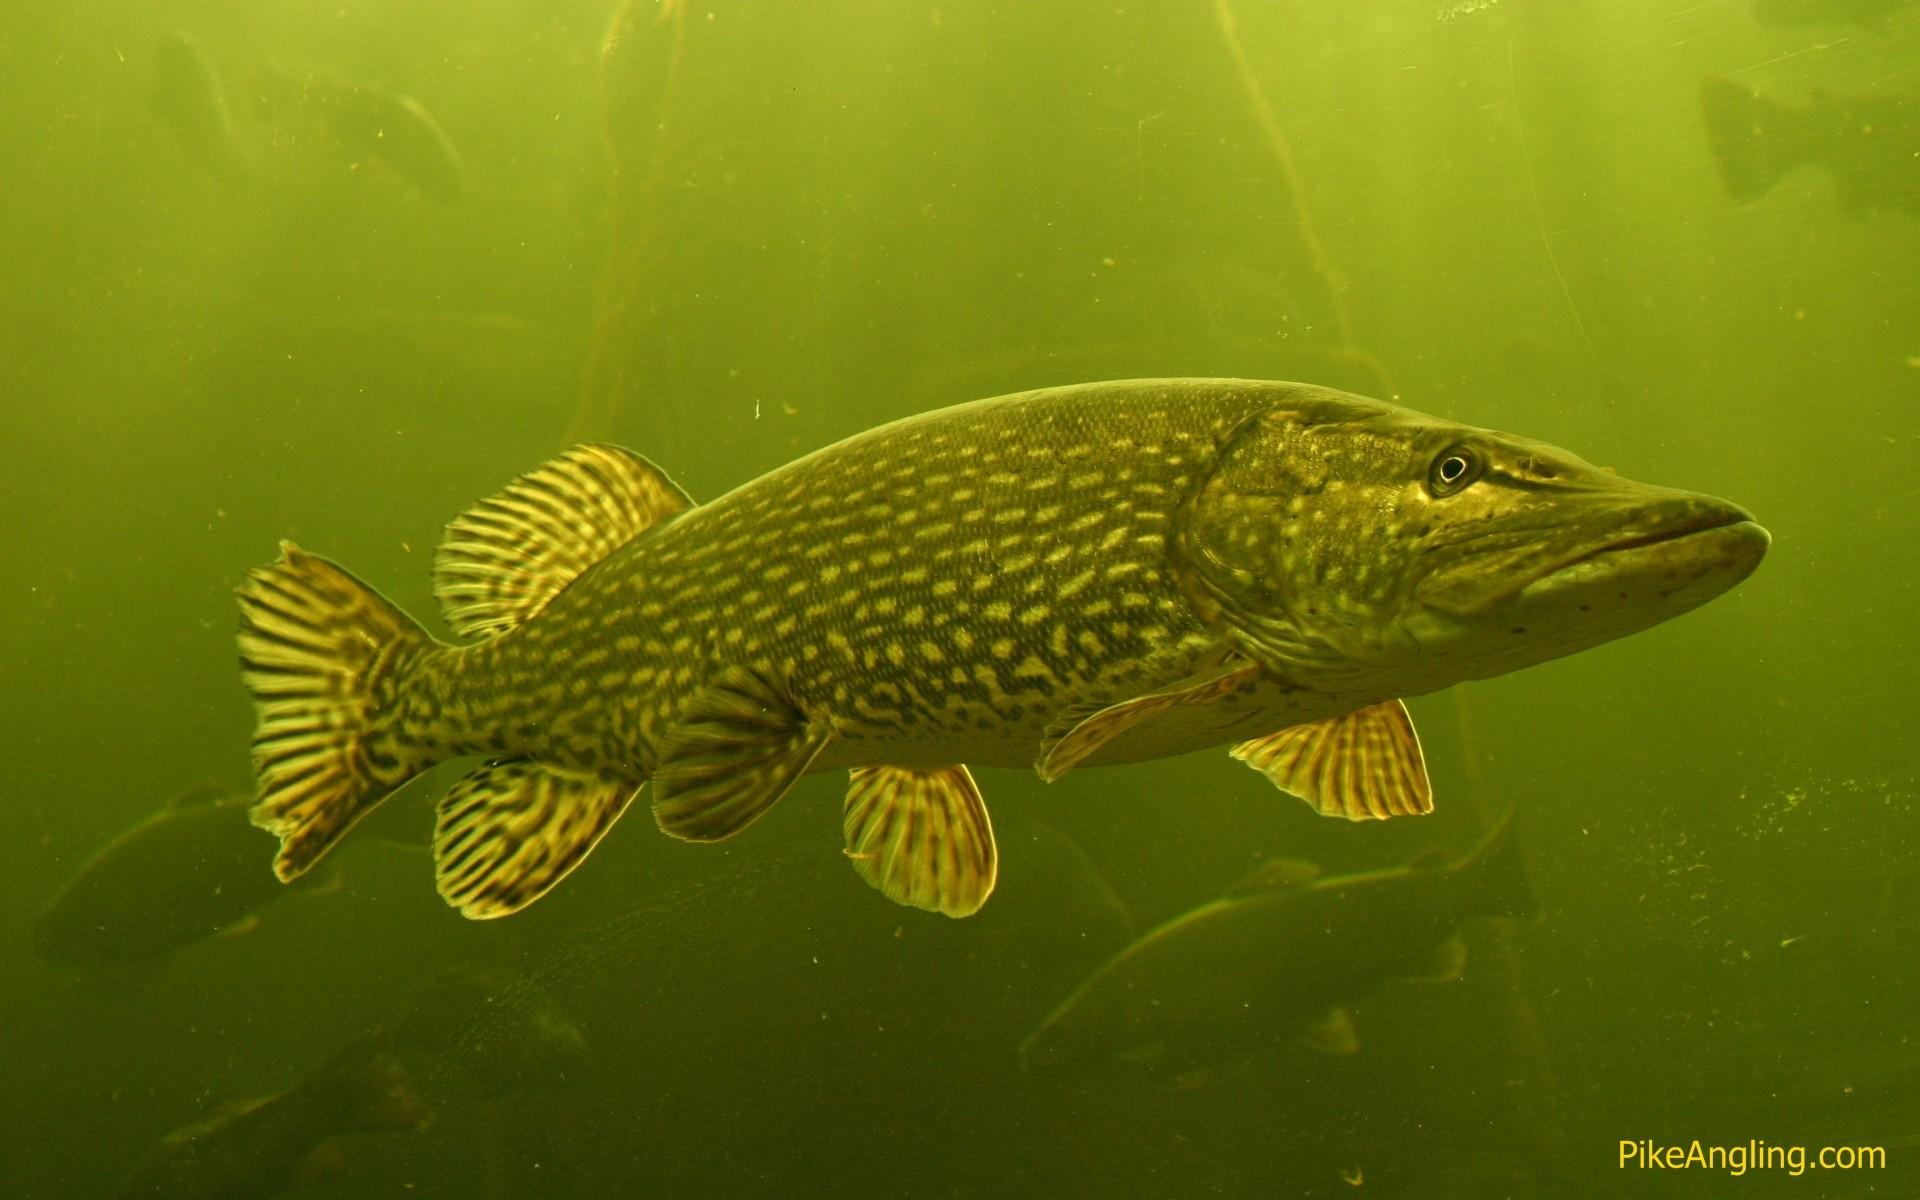 Get free high quality HD wallpapers bass fishing wallpaper hd